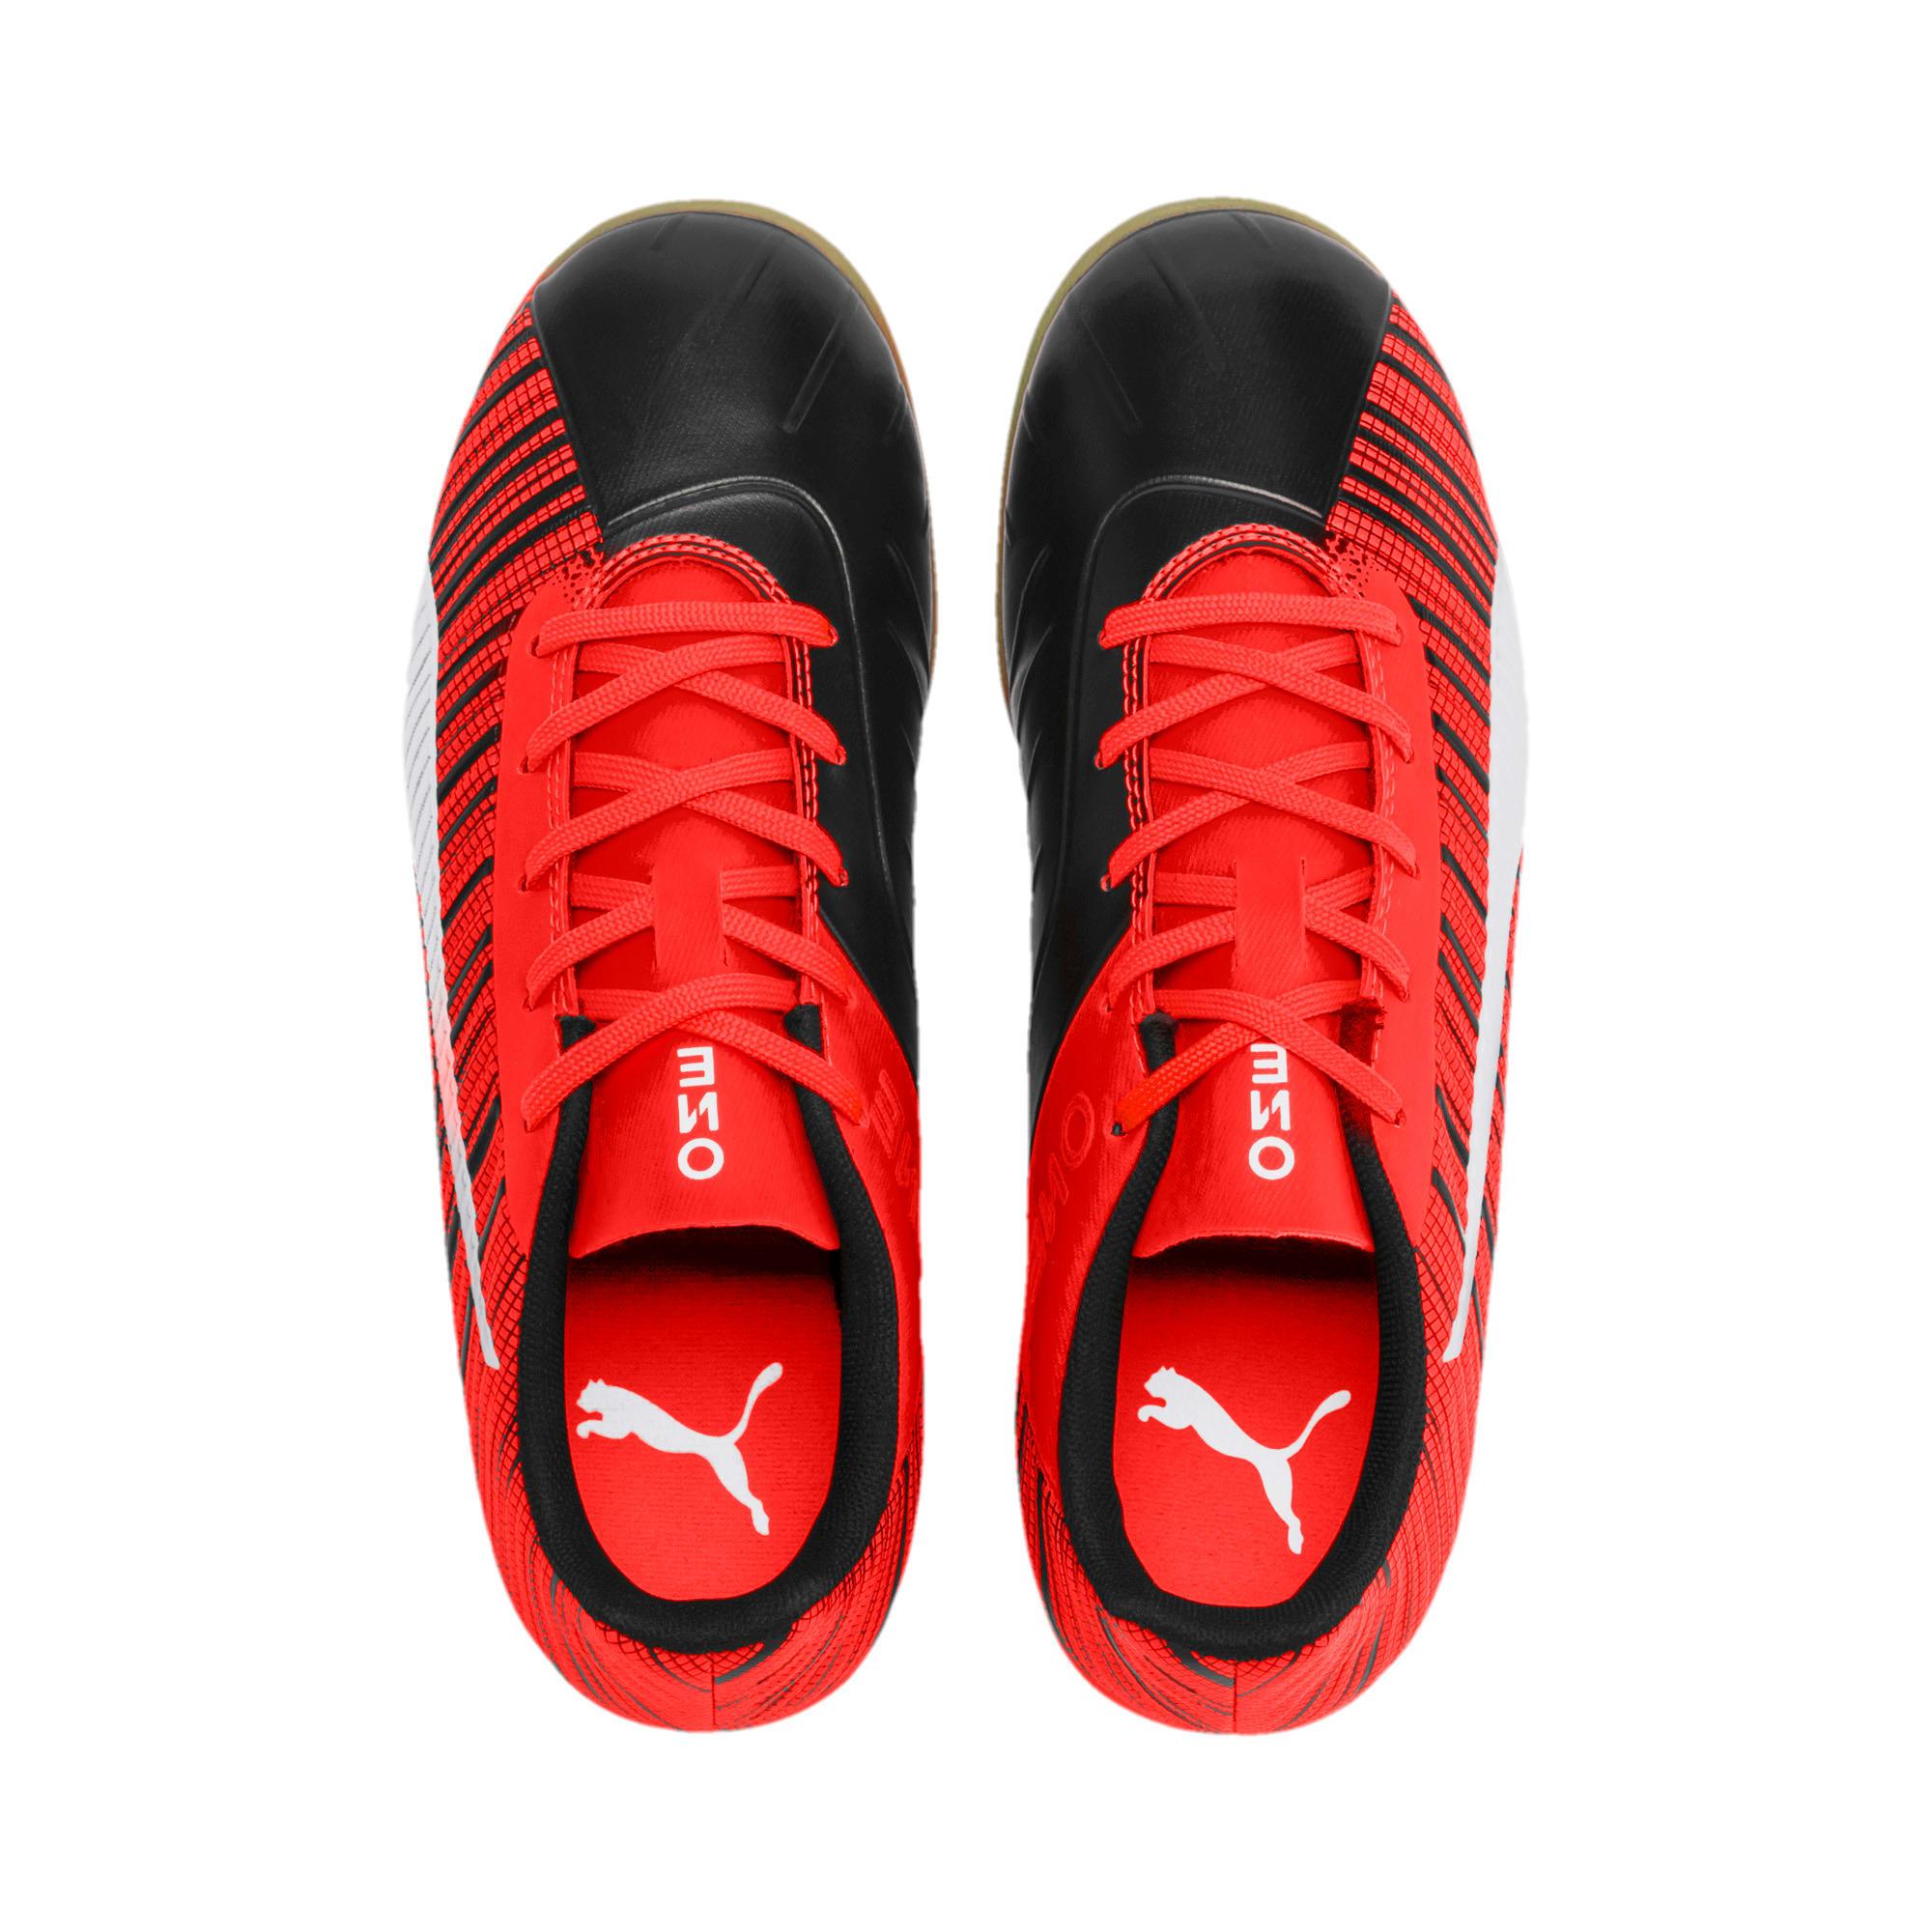 Miniatura 6 de Zapatos de fútbol PUMA ONE 5.4 IT JR, Black-Red-Aged Silver-Gum, mediano